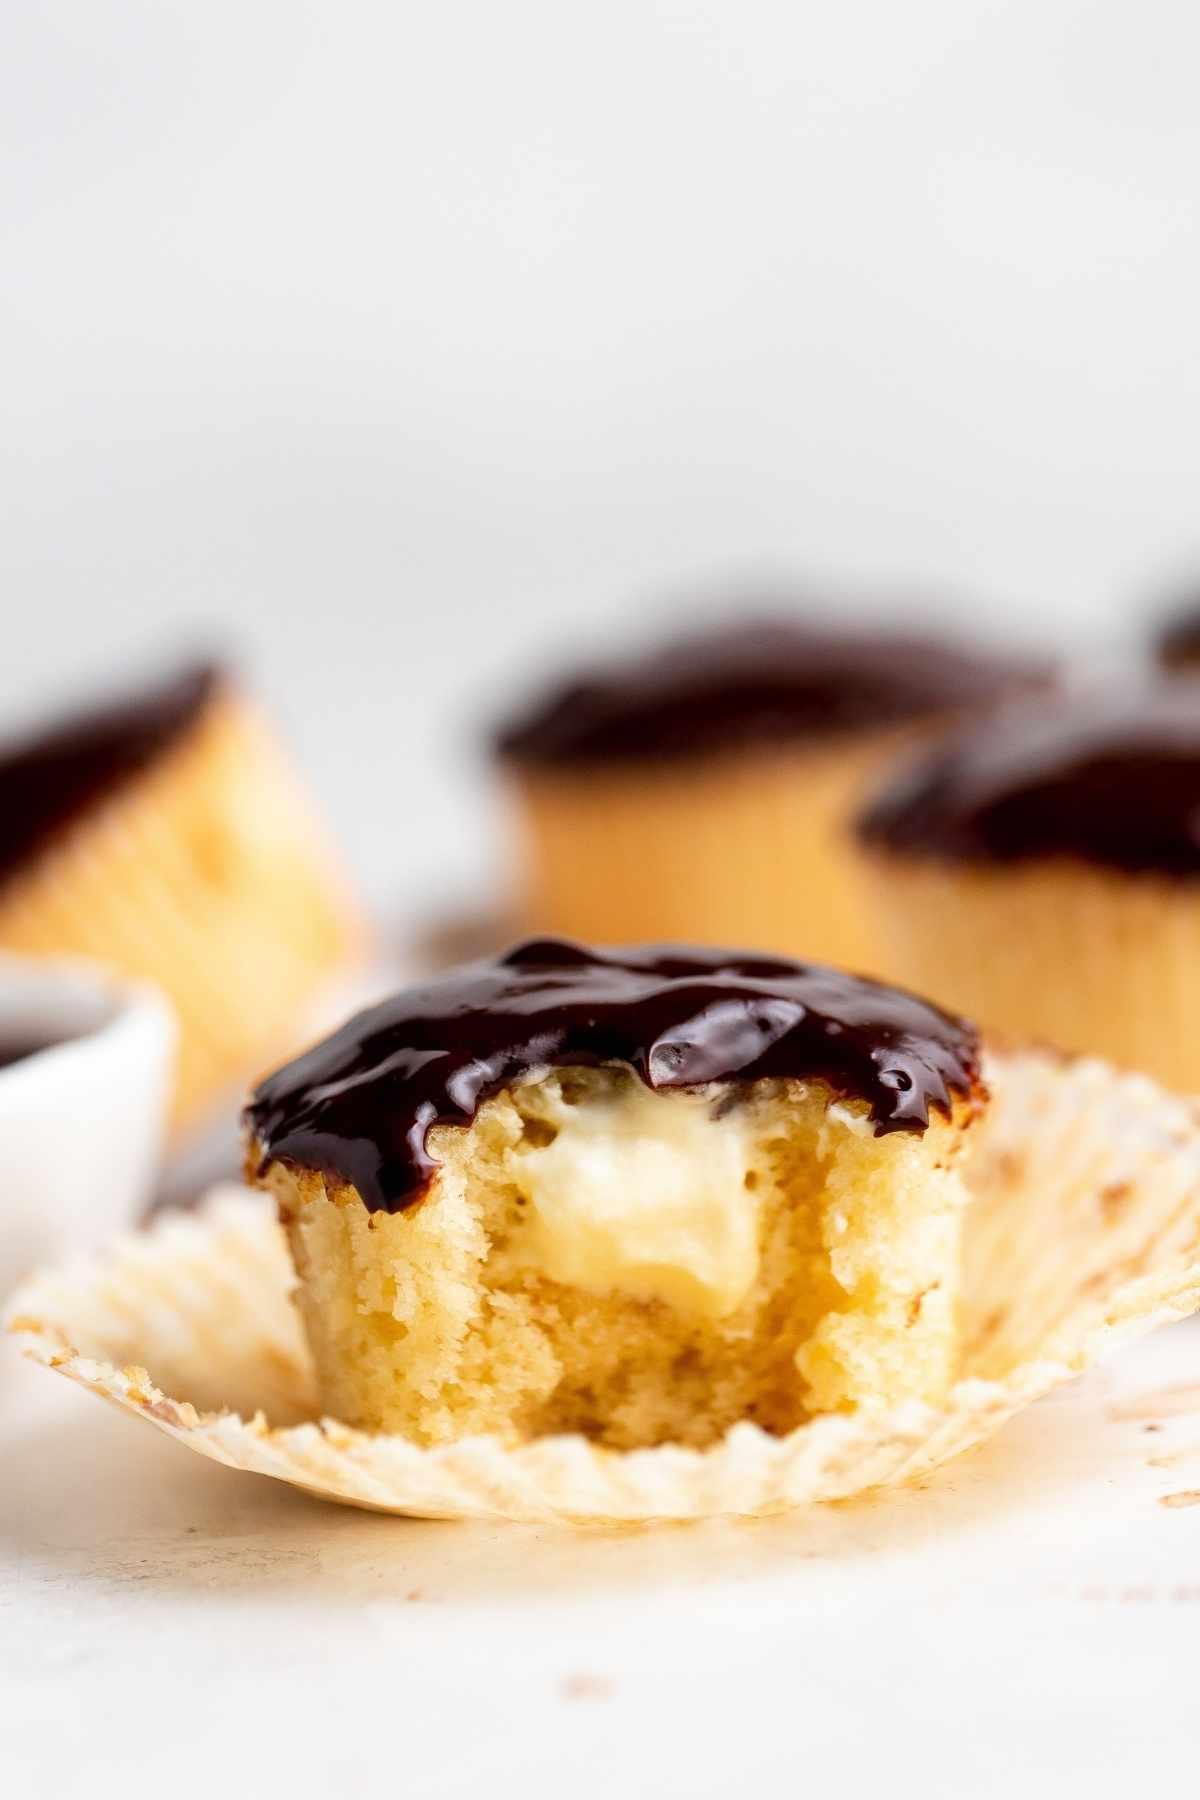 Boston Cream Cupcakes vanilla cupcake with bite exposing cream filling and chocolate ganache frosting